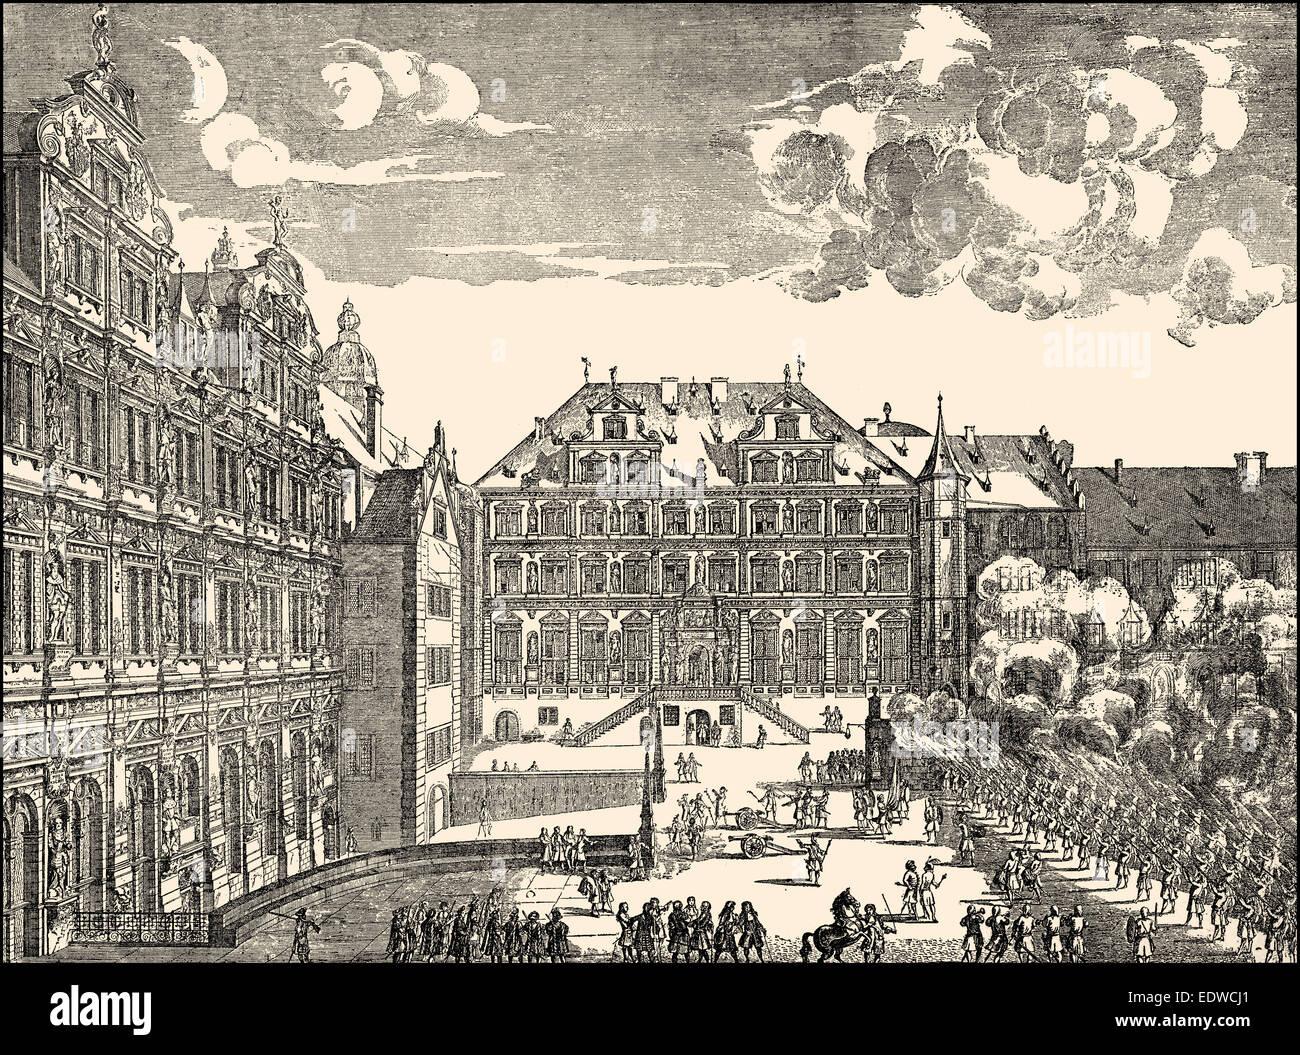 A Foot drill at Heidelberger Castle, 17th century, Heidelberg, Baden-Wuerttemberg, Germany, Europe - Stock Image